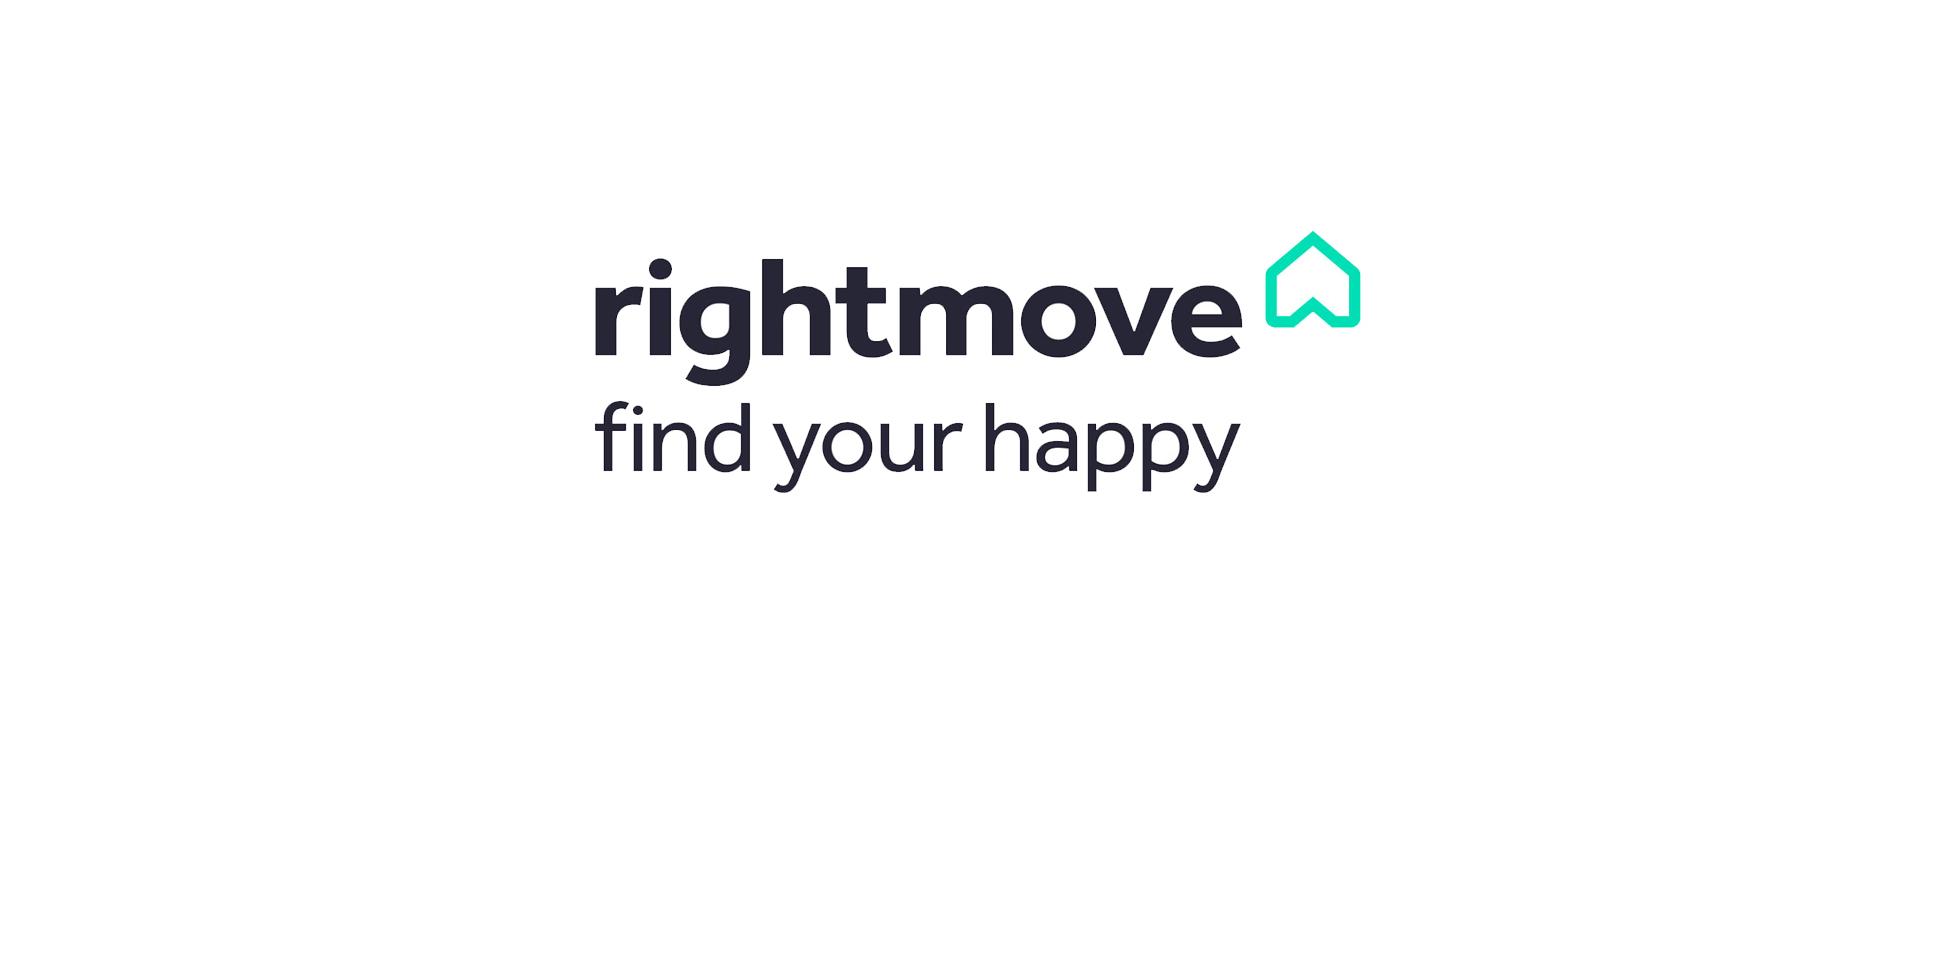 Rightmove, new identity